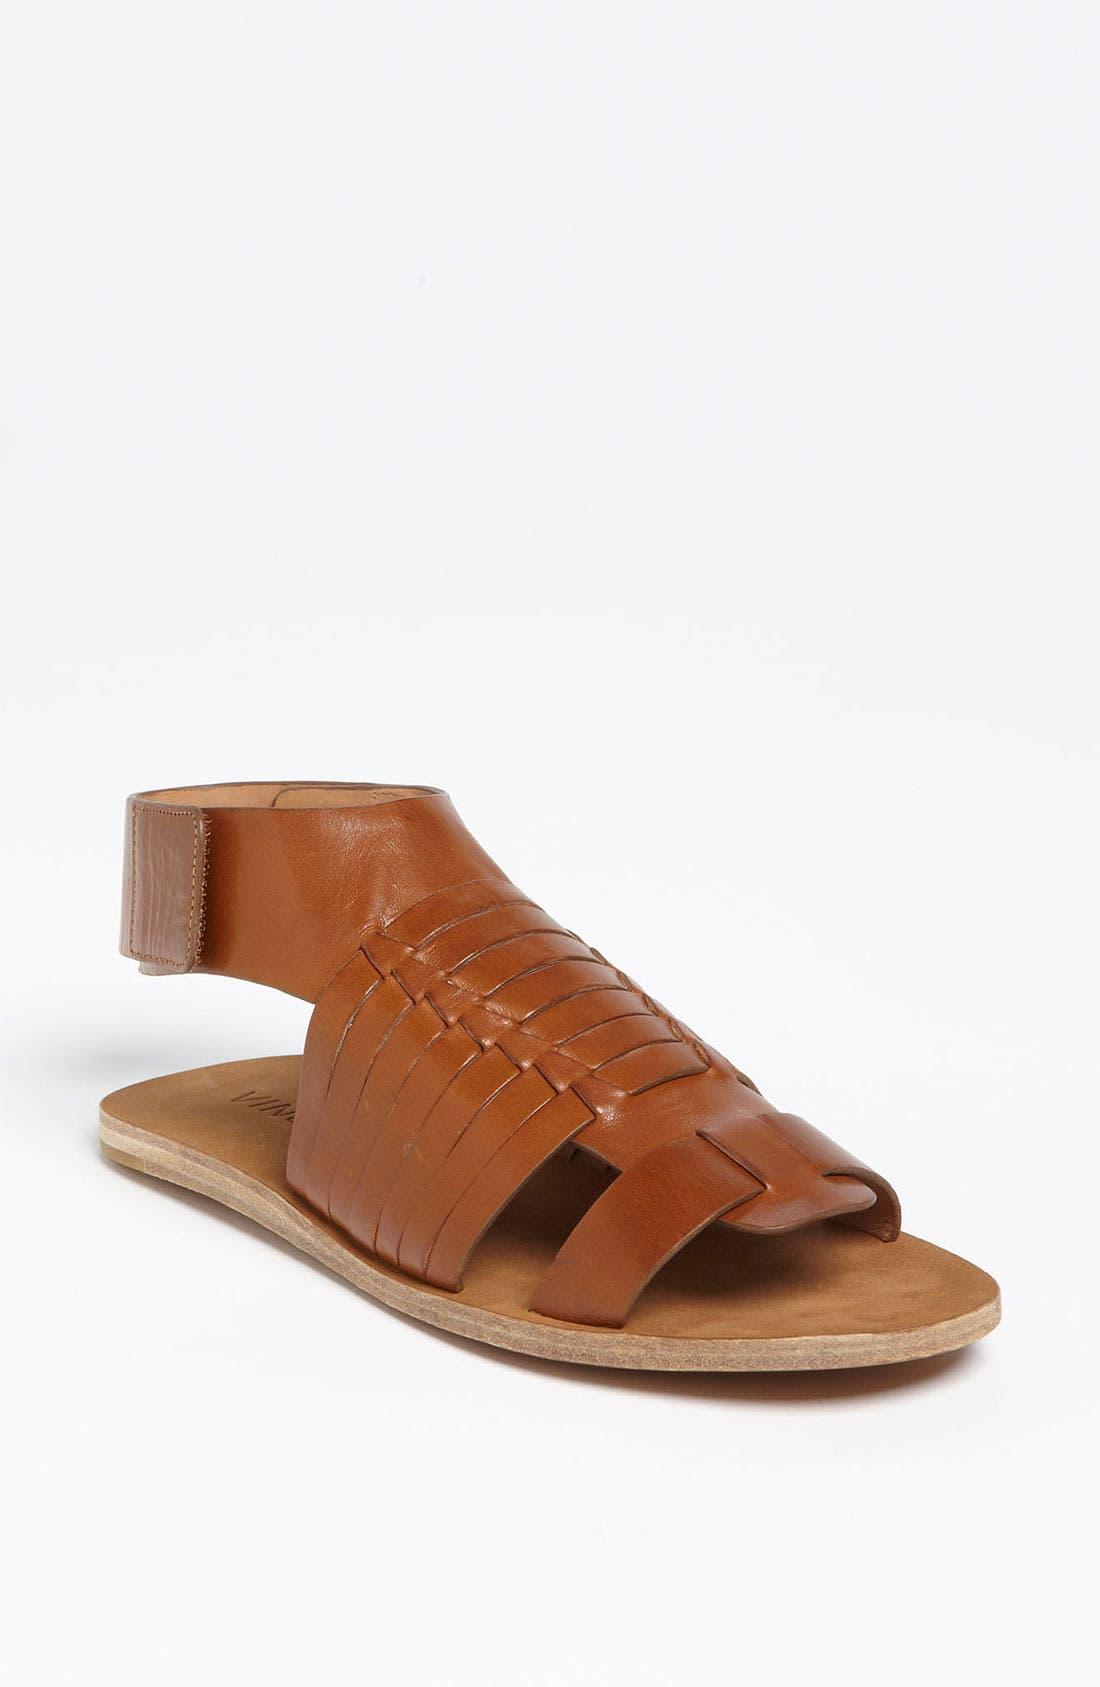 Main Image - Vince 'Calista' Sandal